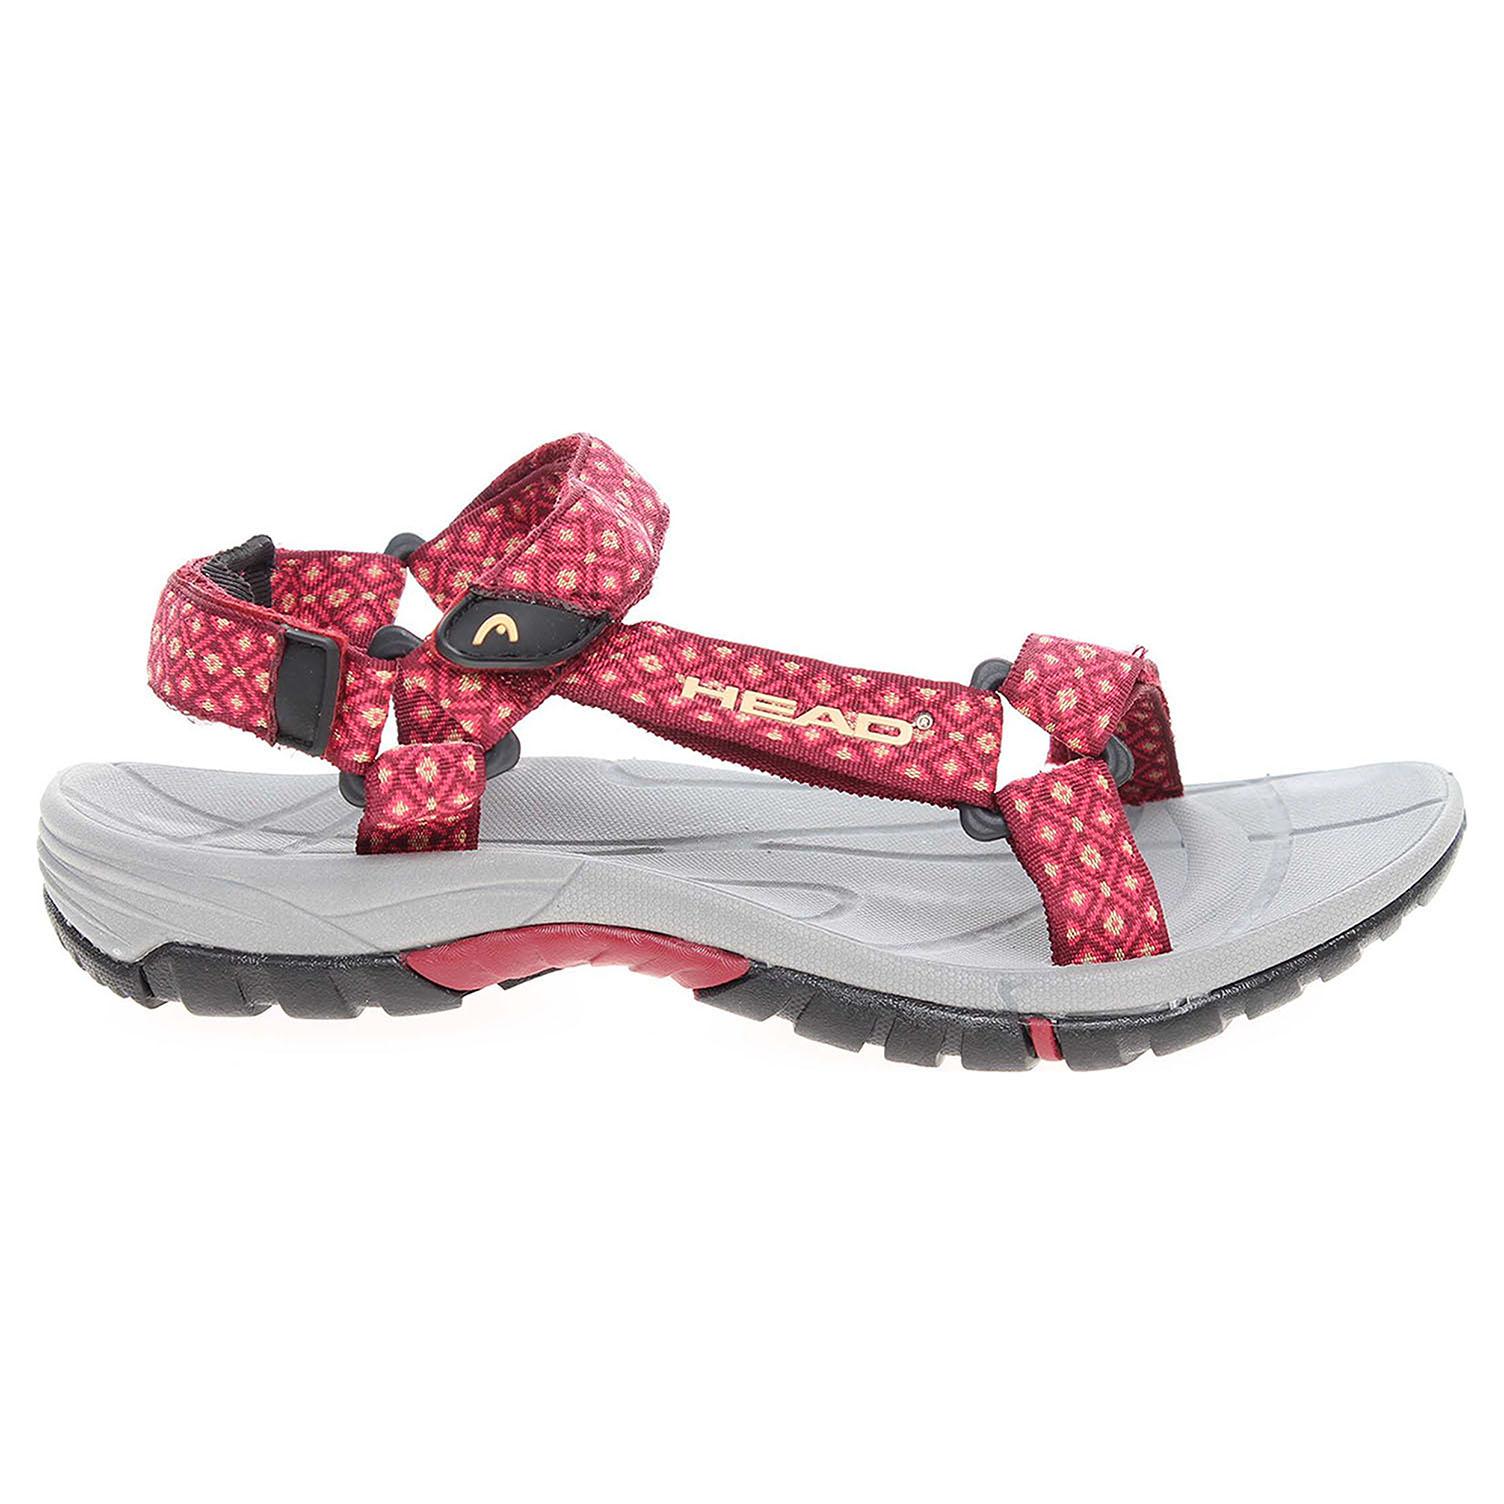 Ecco Head dámské sandály HY-212-25-03 červené 23801176